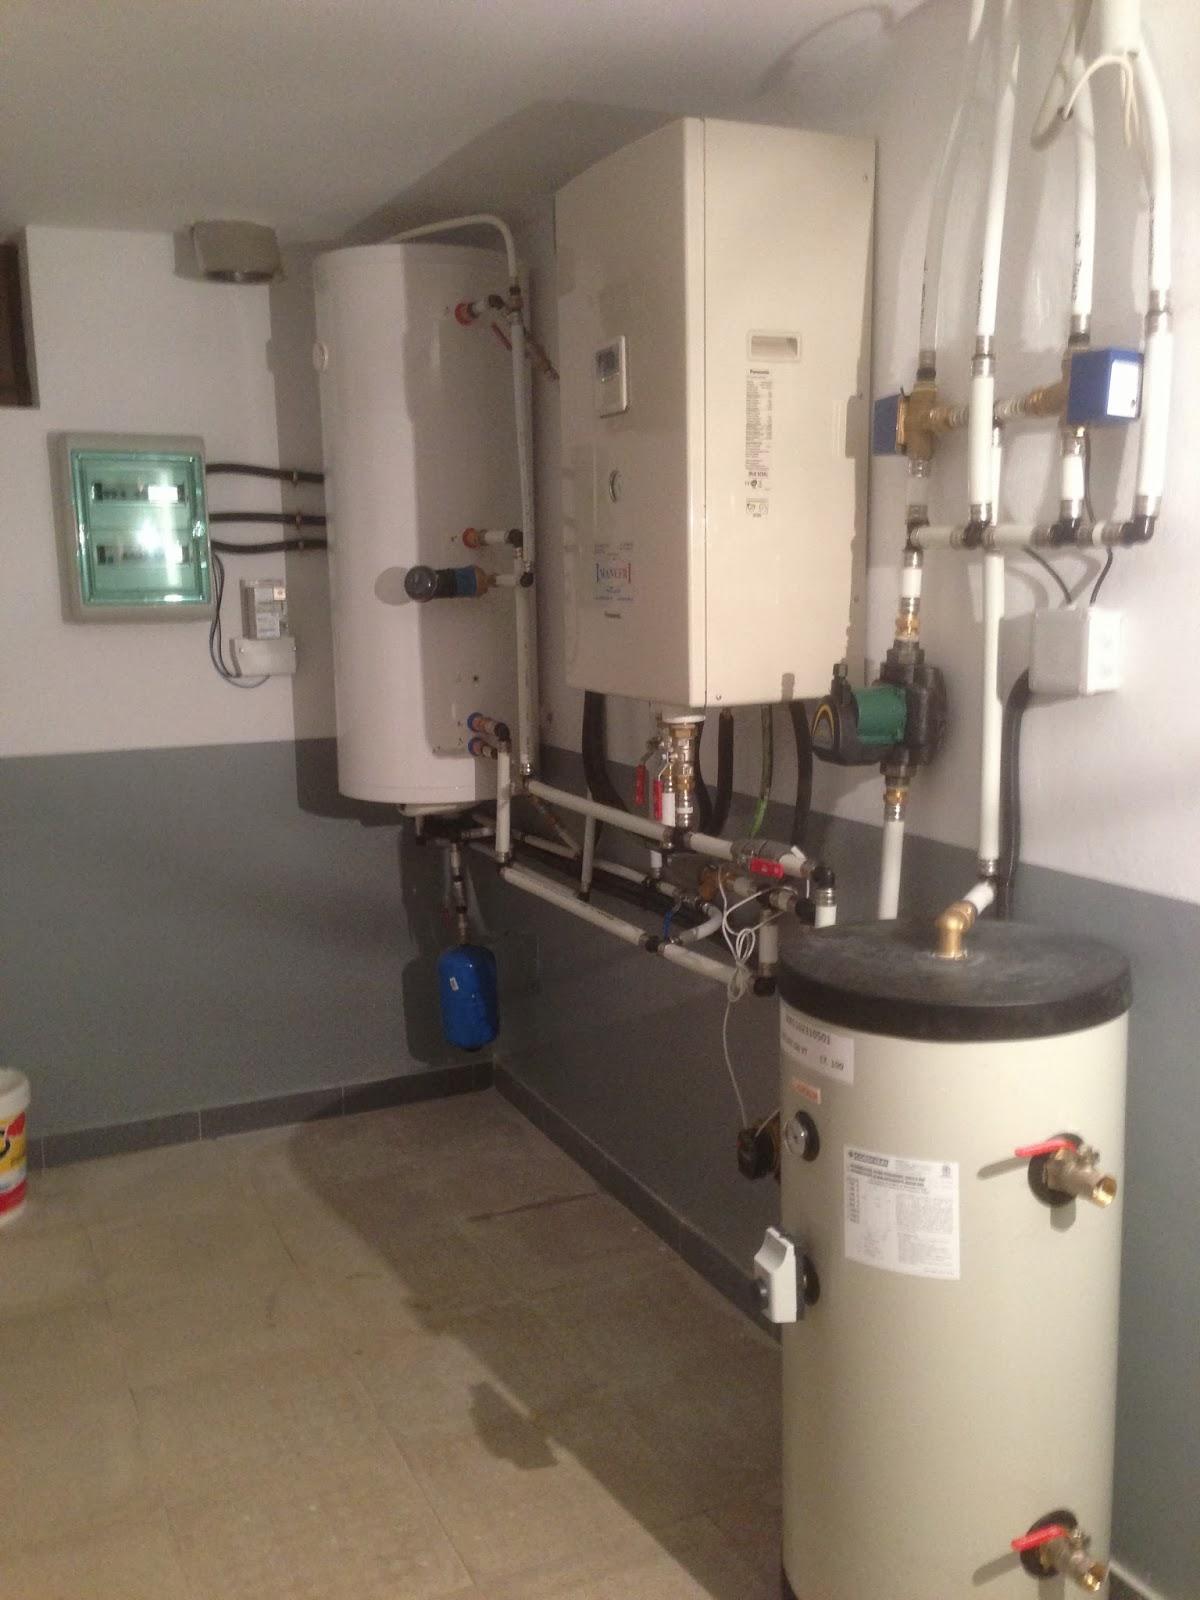 Climatizaci n aerotermia geotermia y renovables para for Calefaccion bomba de calor radiadores